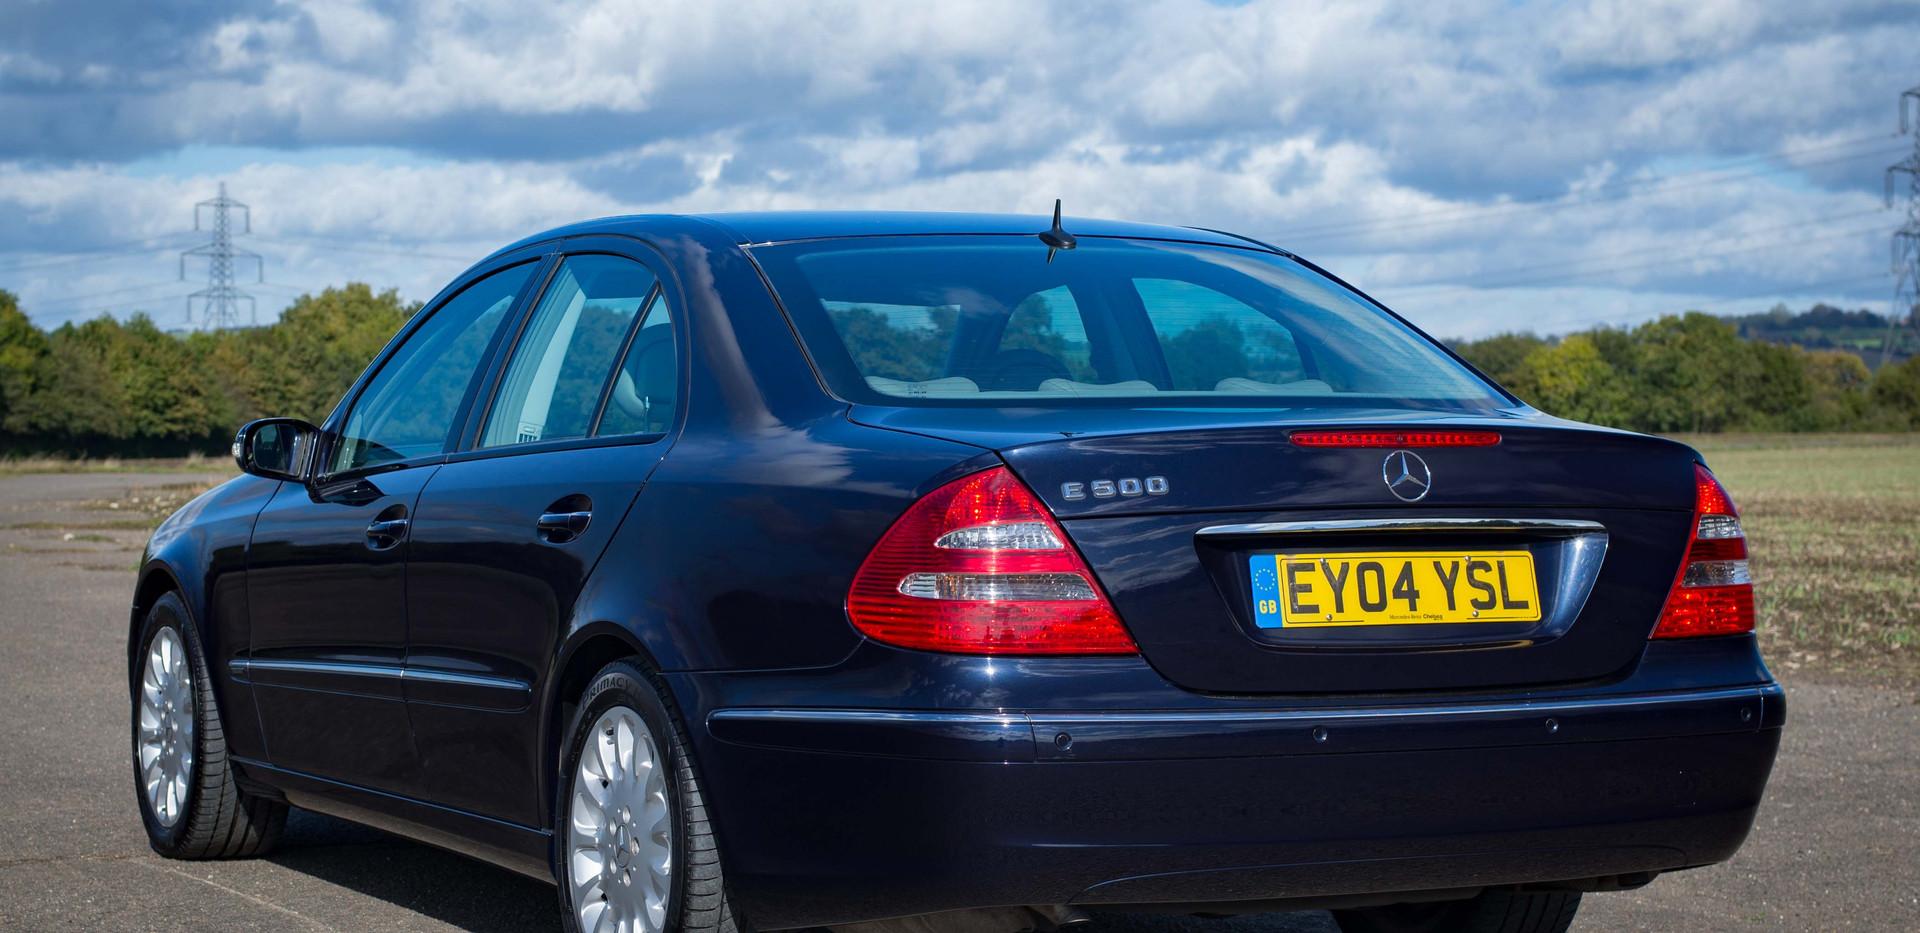 Mercedes E500 For Sale UK London  (2 of